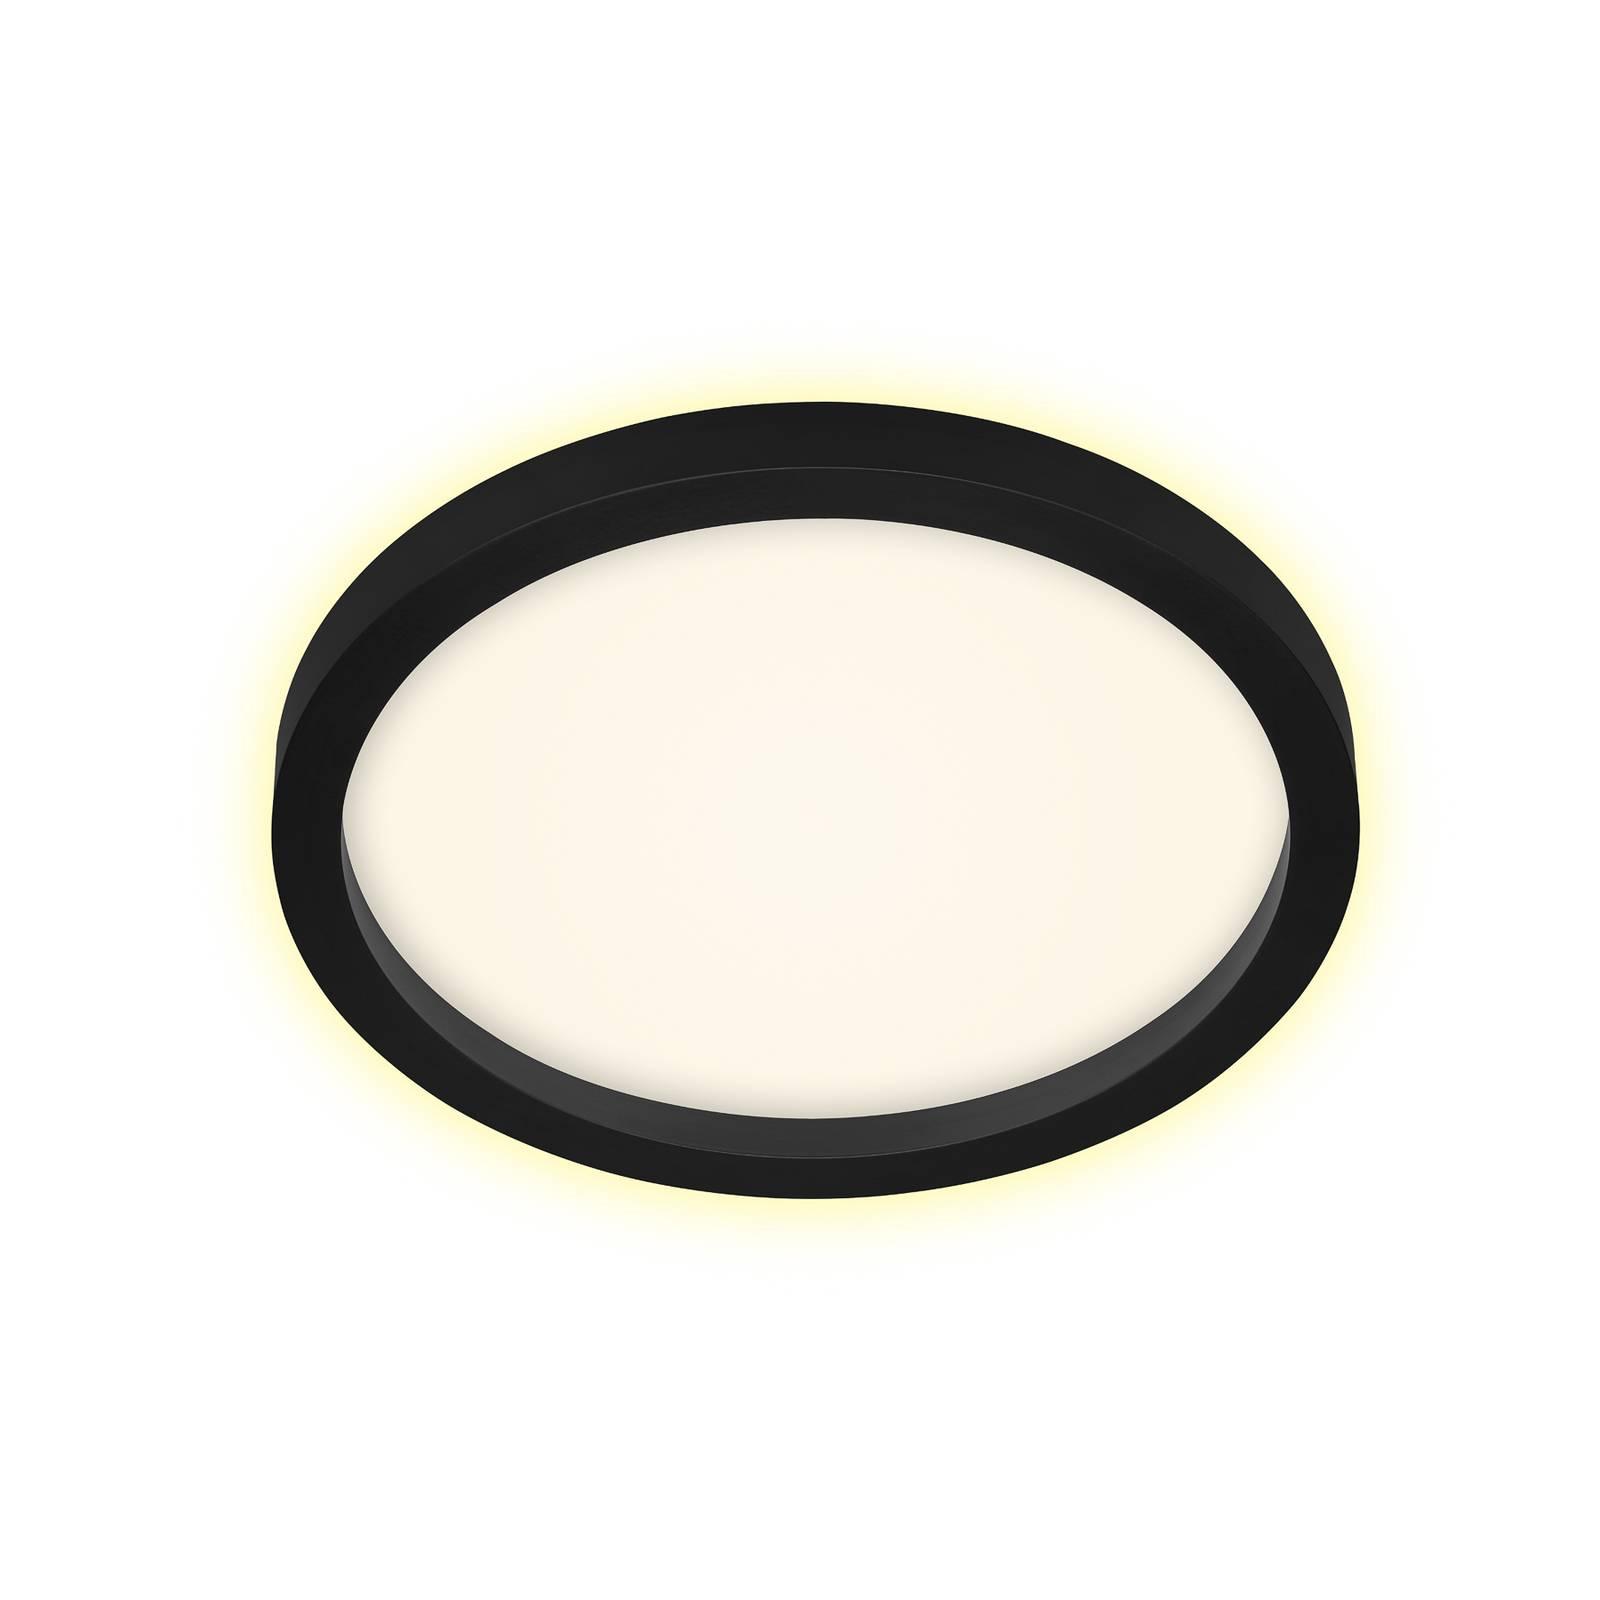 Prios Avira -LED-kattovalaisin pyöreä, 29 cm